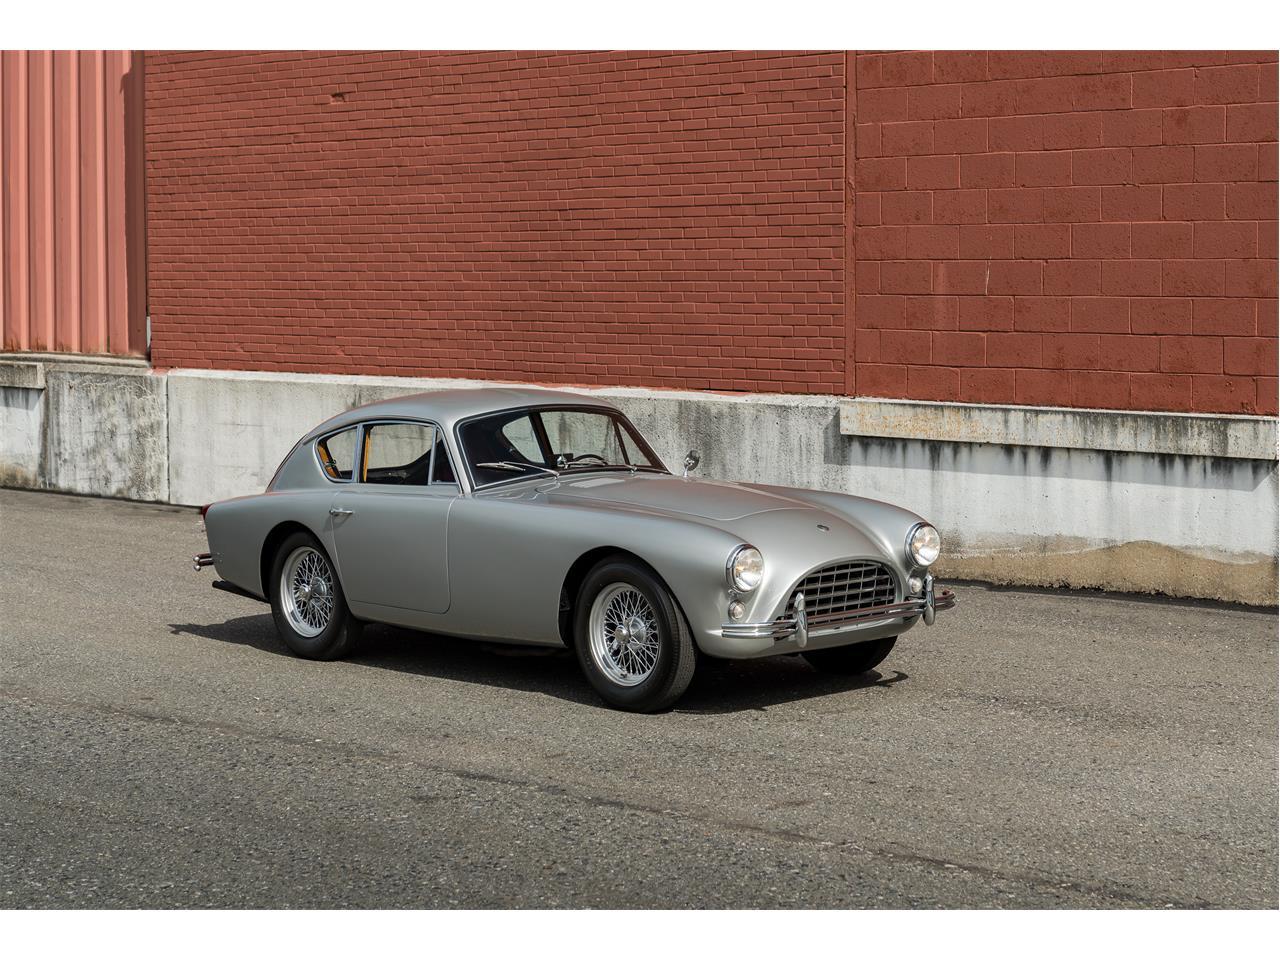 1956 AC Aceca (CC-1354592) for sale in Philadelphia, Pennsylvania